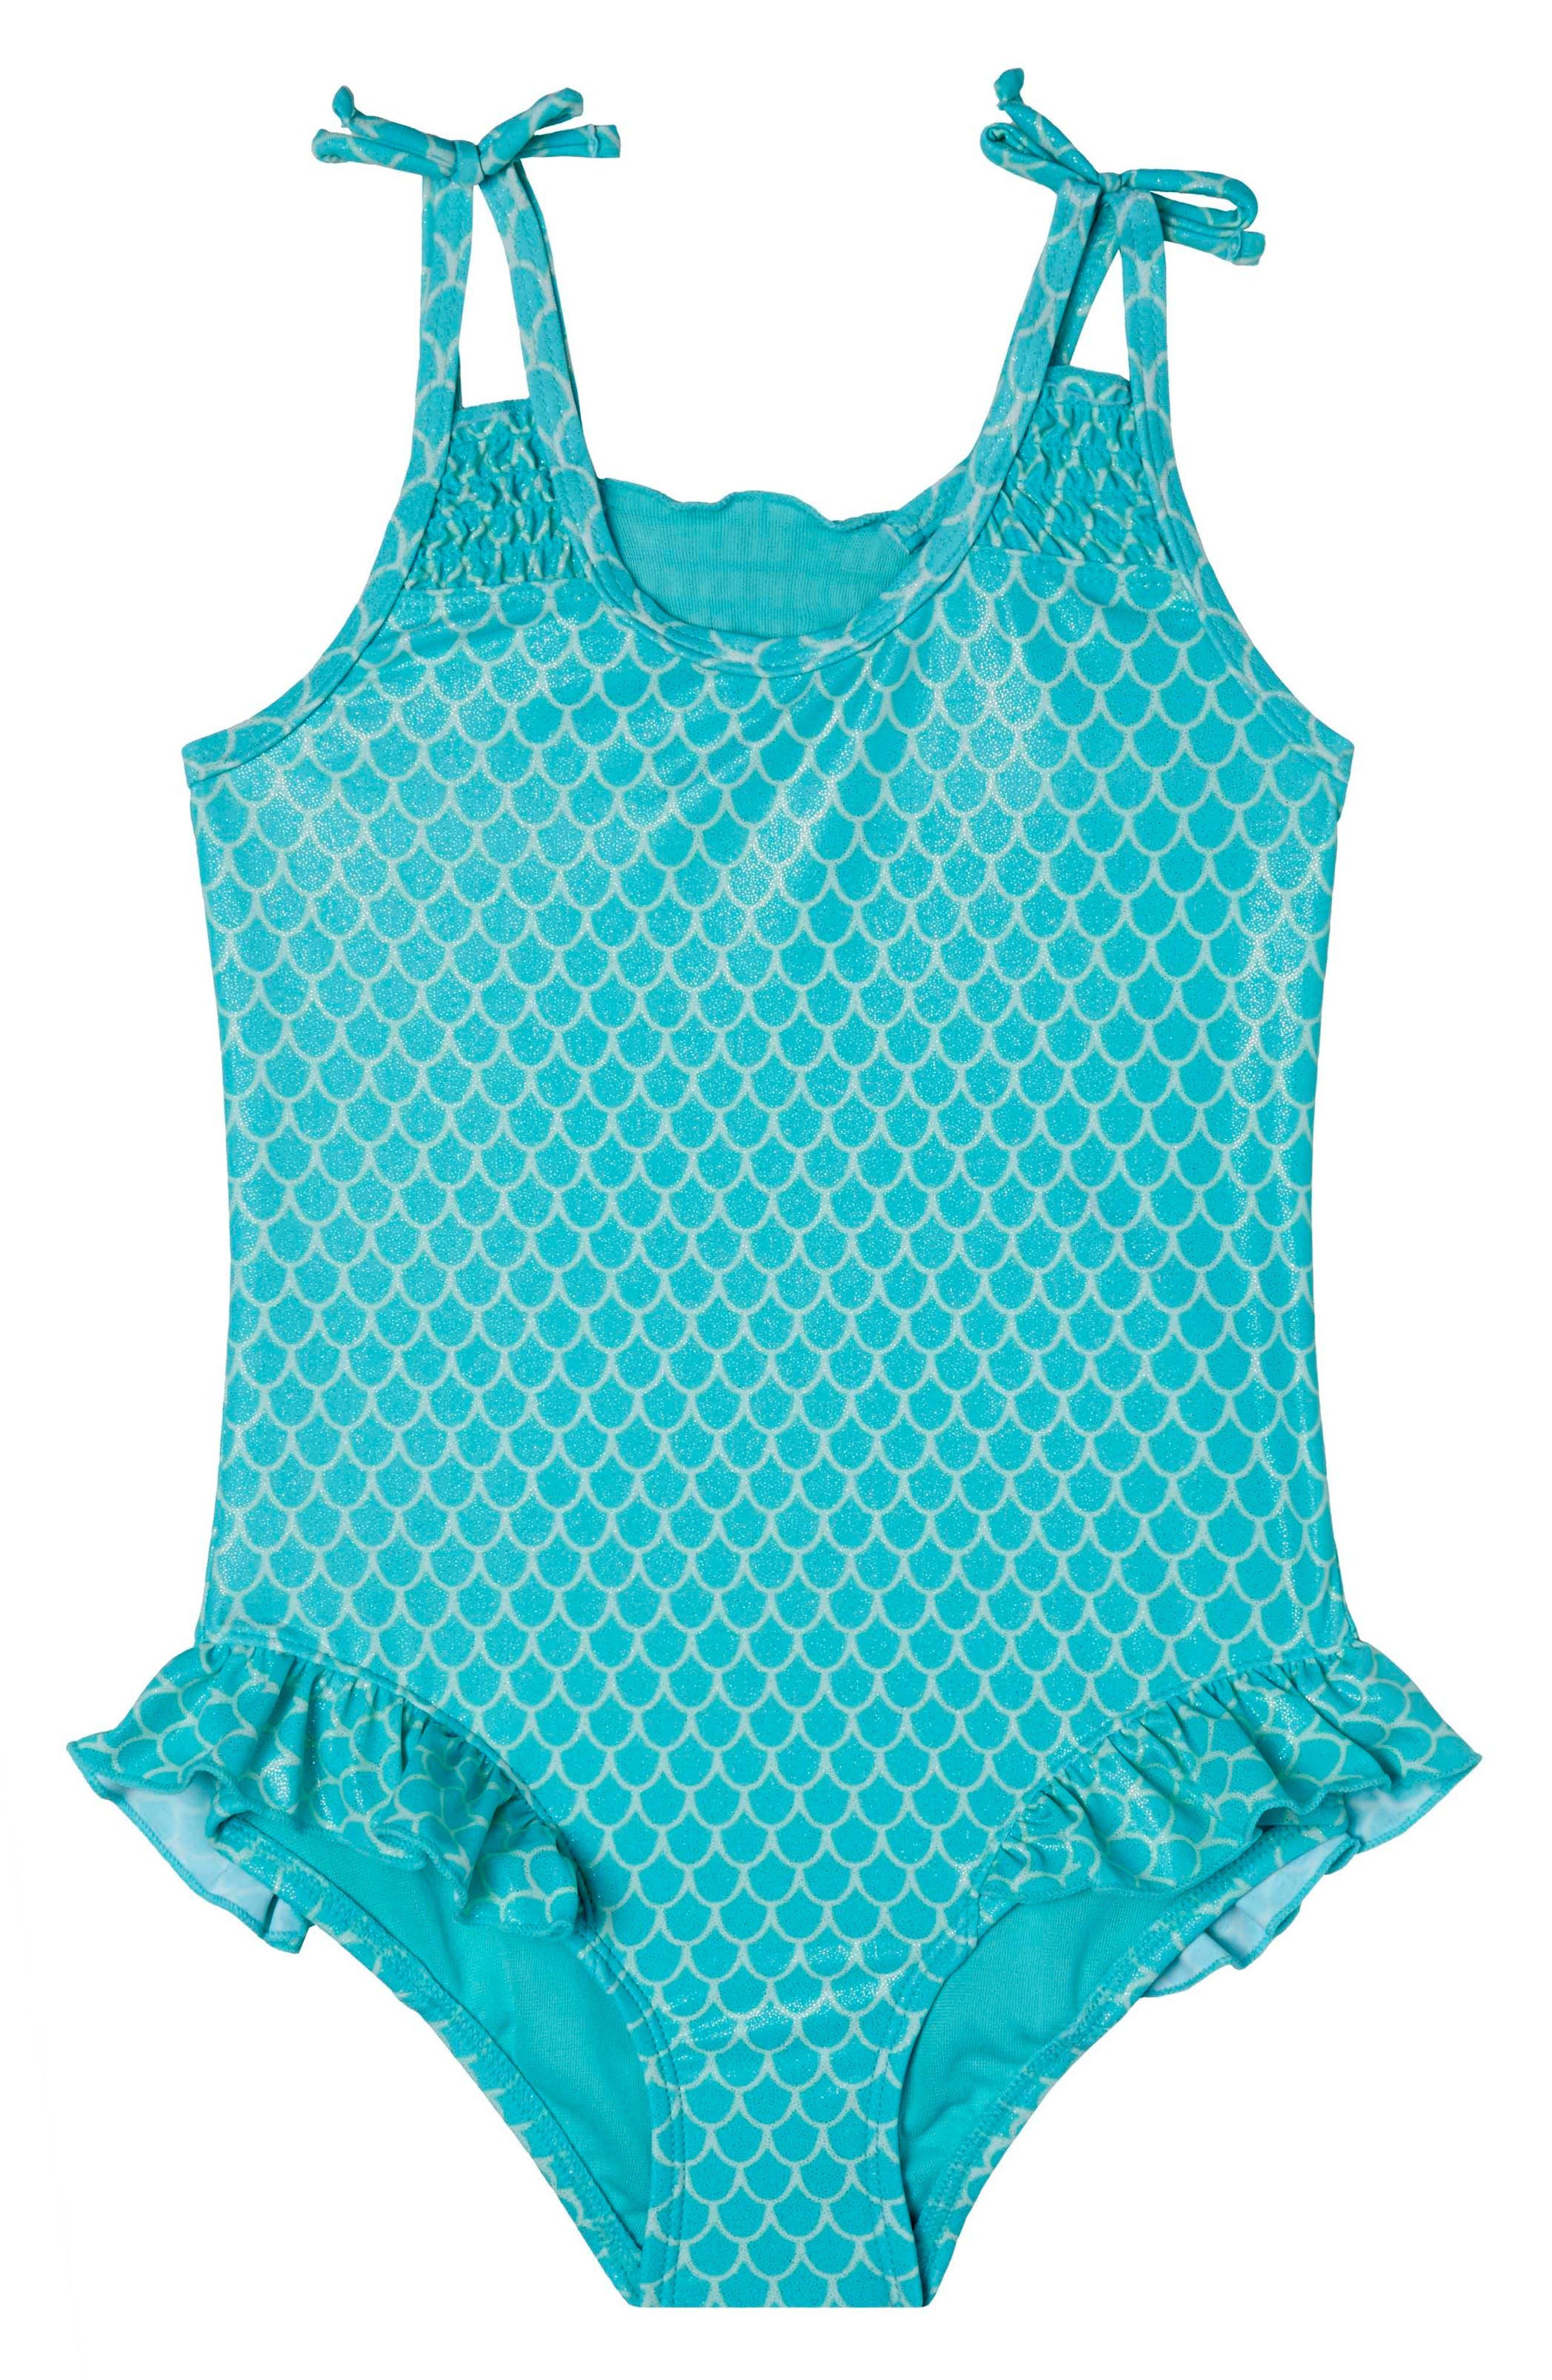 Alternate Image 1 Selected - Hula Star Mermaid Princess One-Piece Swimsuit (Toddler Girls & Little Girls)